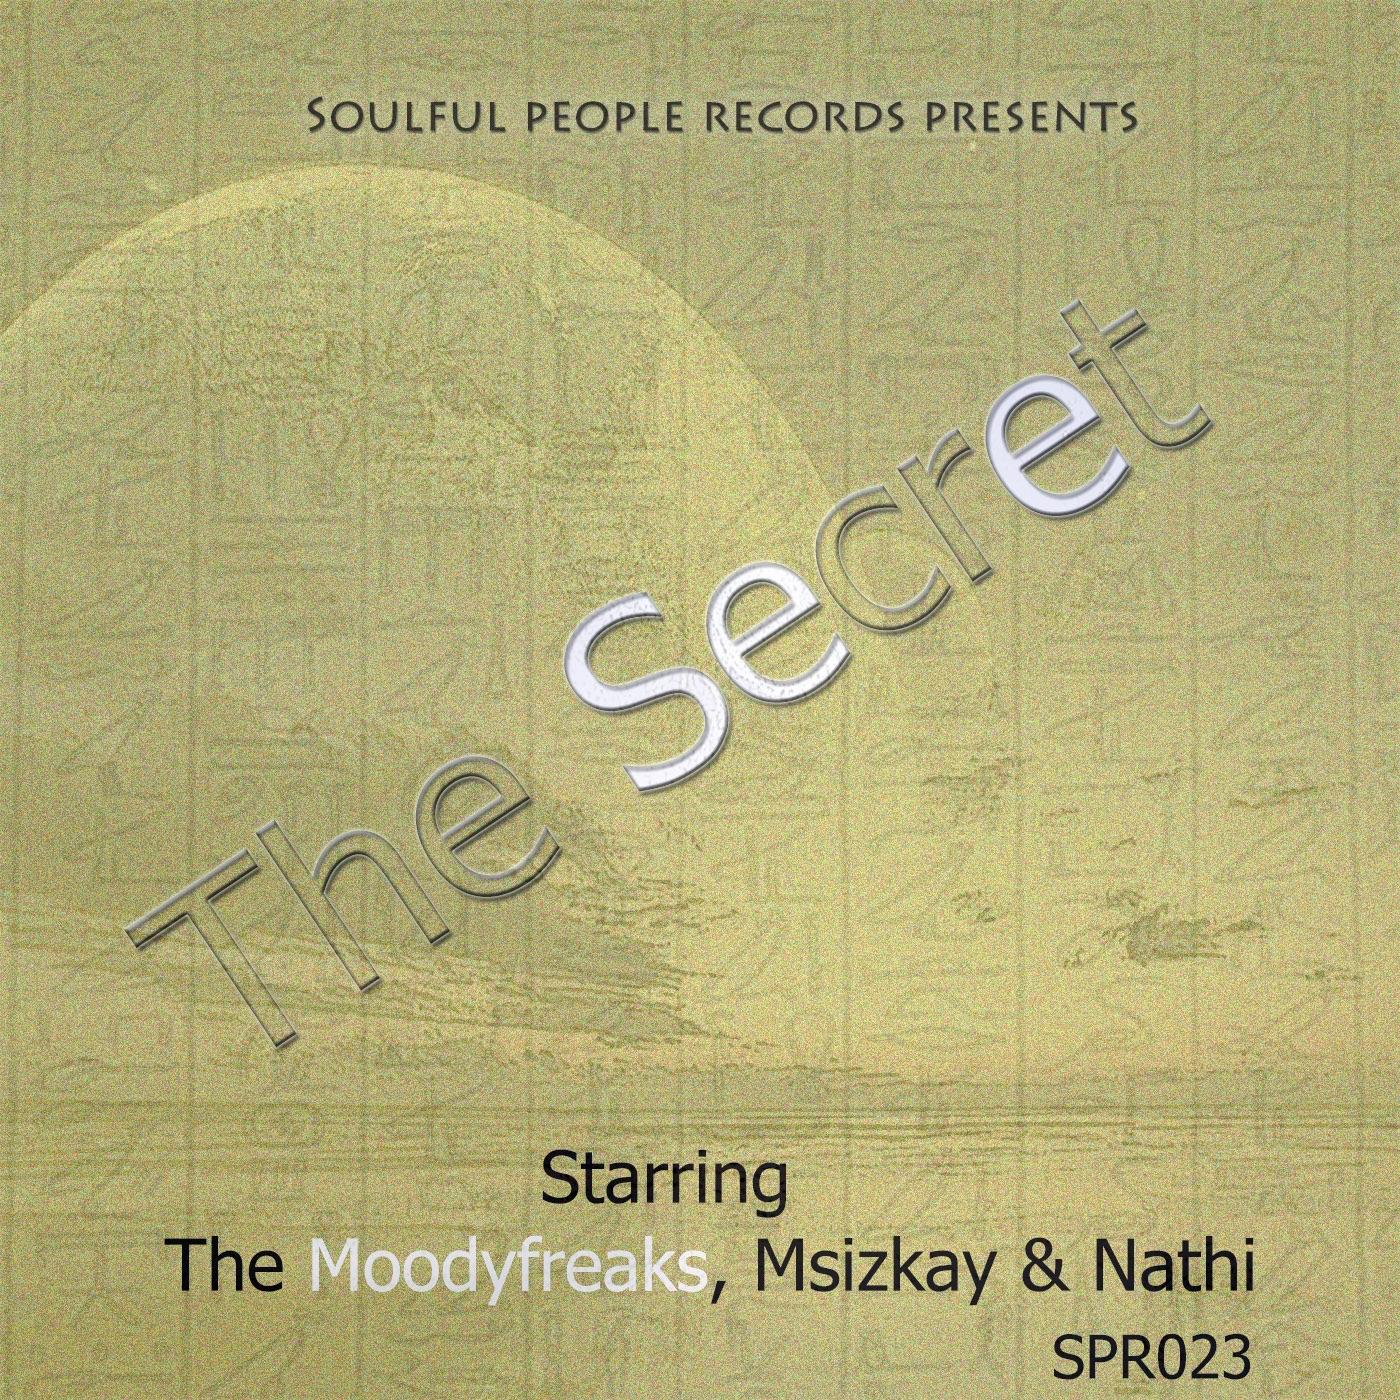 The Secret (Original Extended Mix) [feat. Msizkay & Nathi] - Single